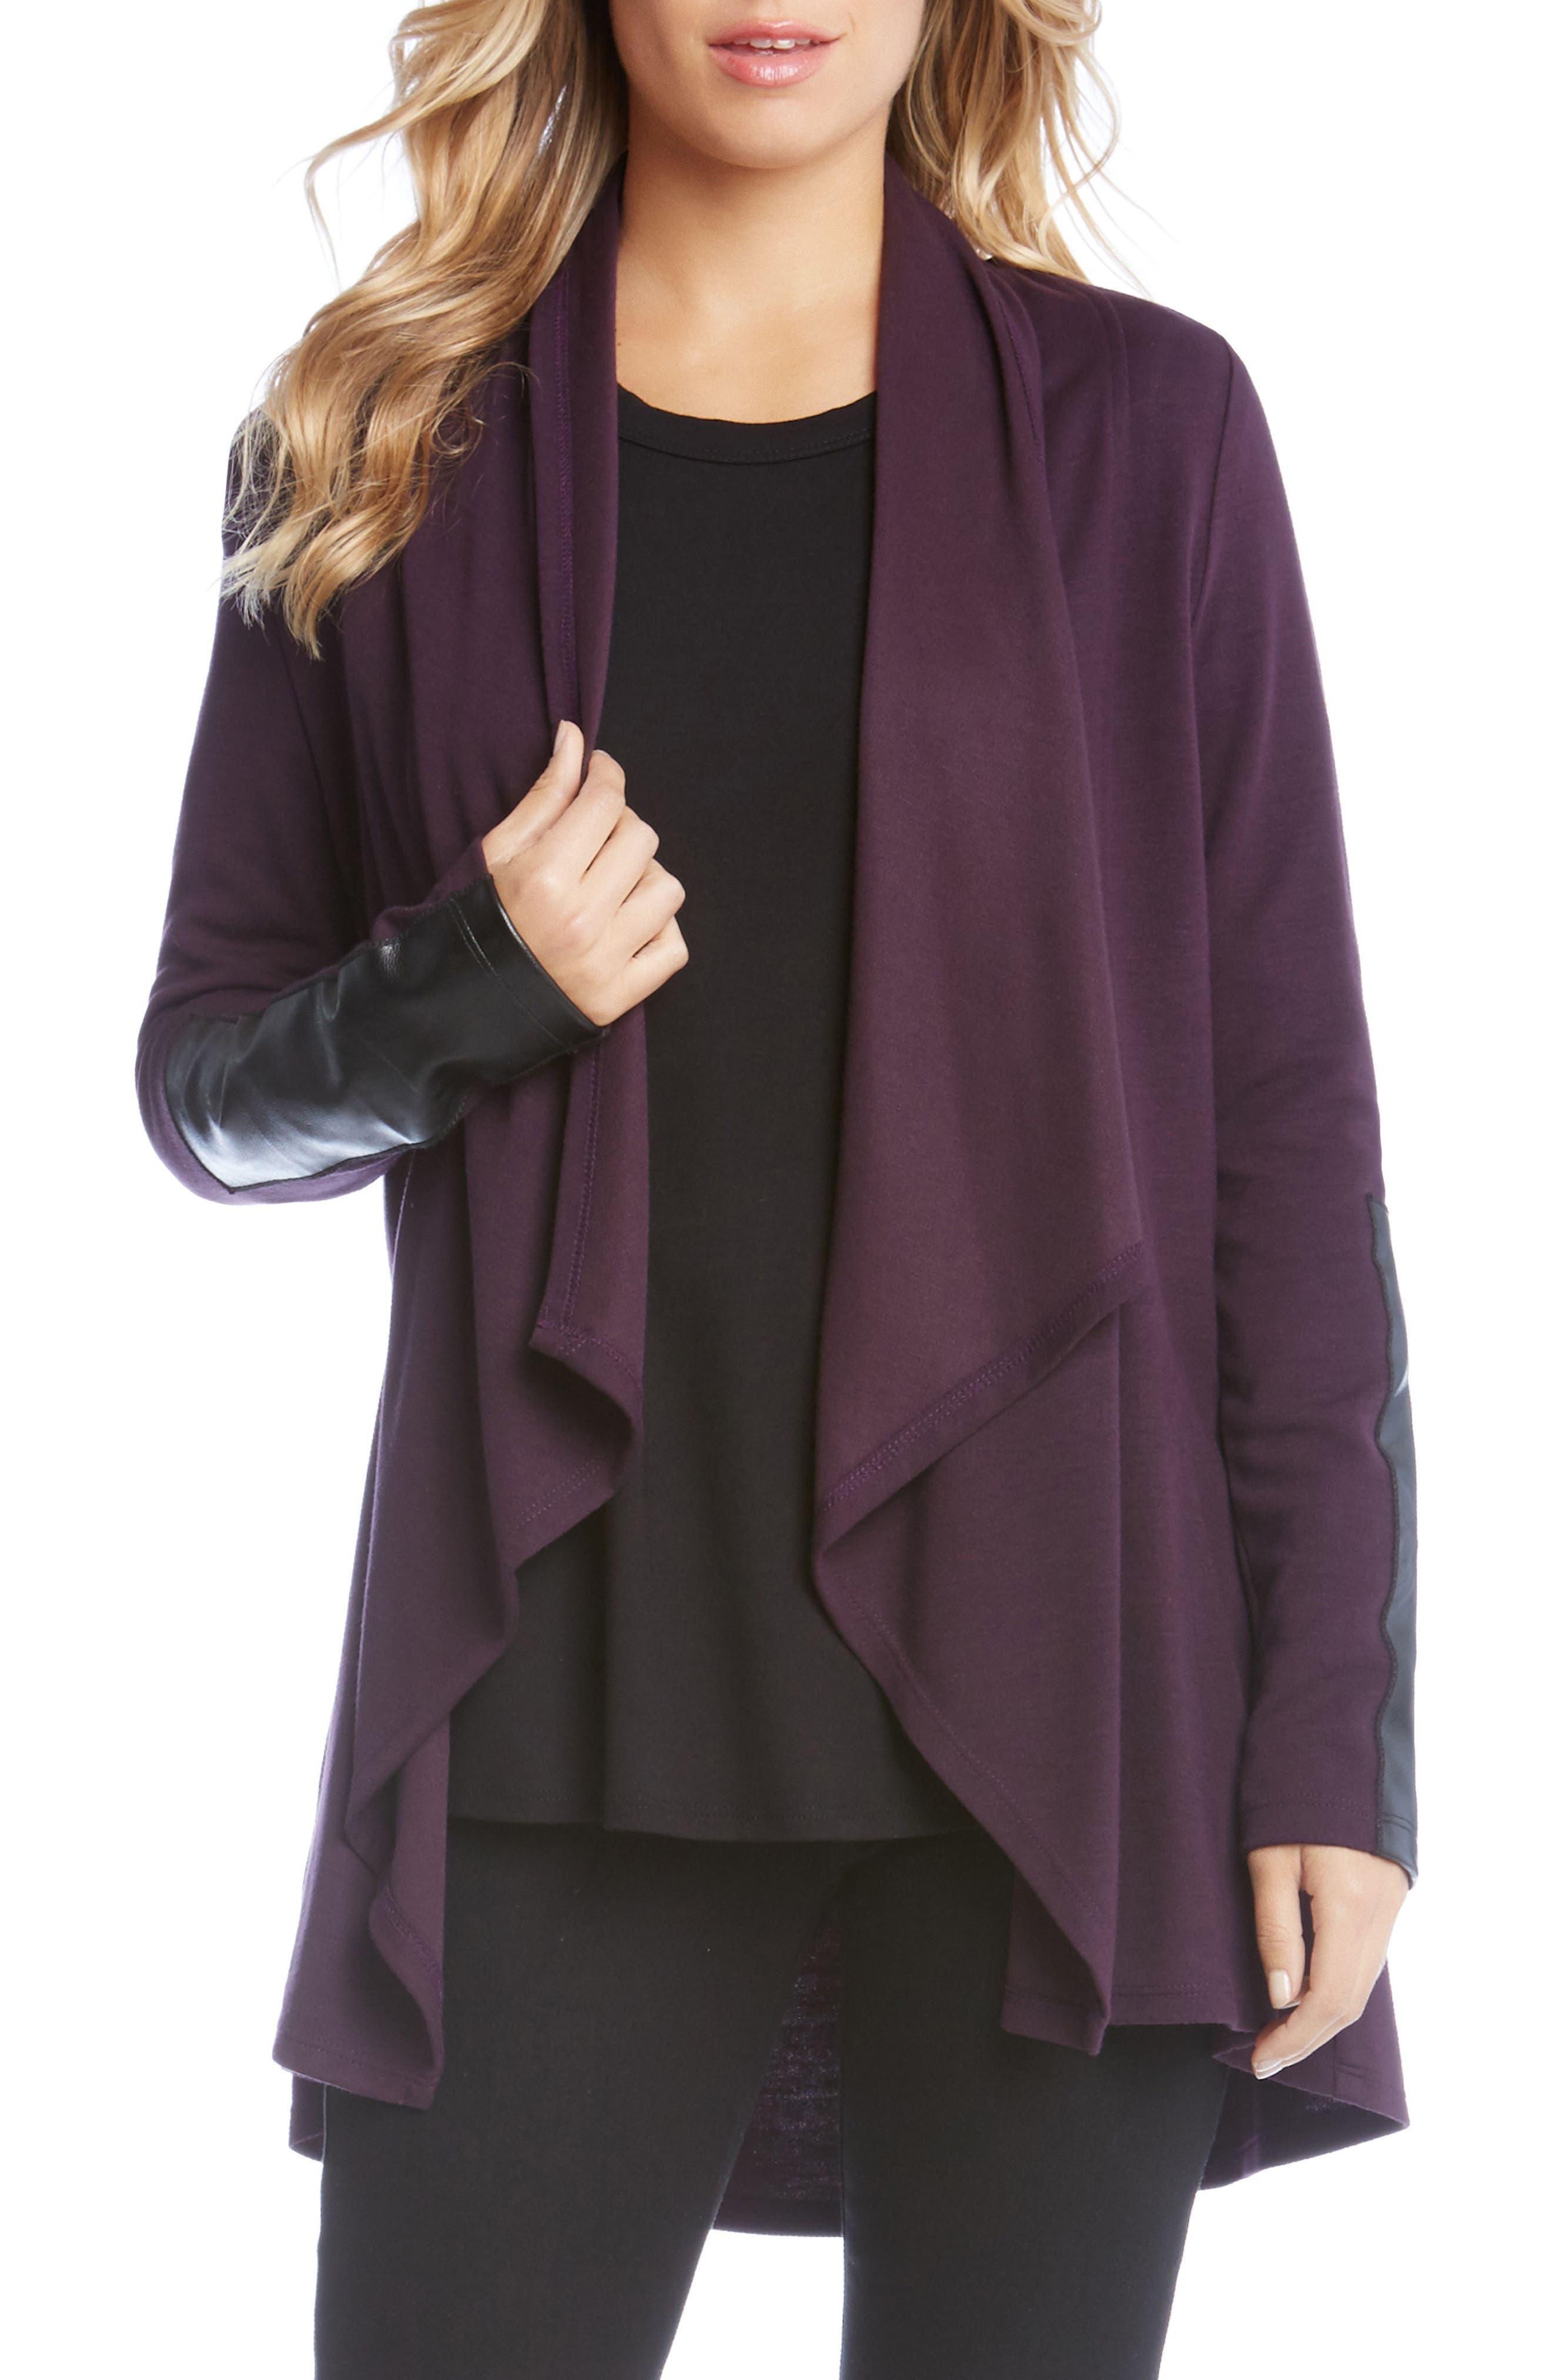 Main Image - Karen Kane Faux Leather Patch Fleece Knit Jacket